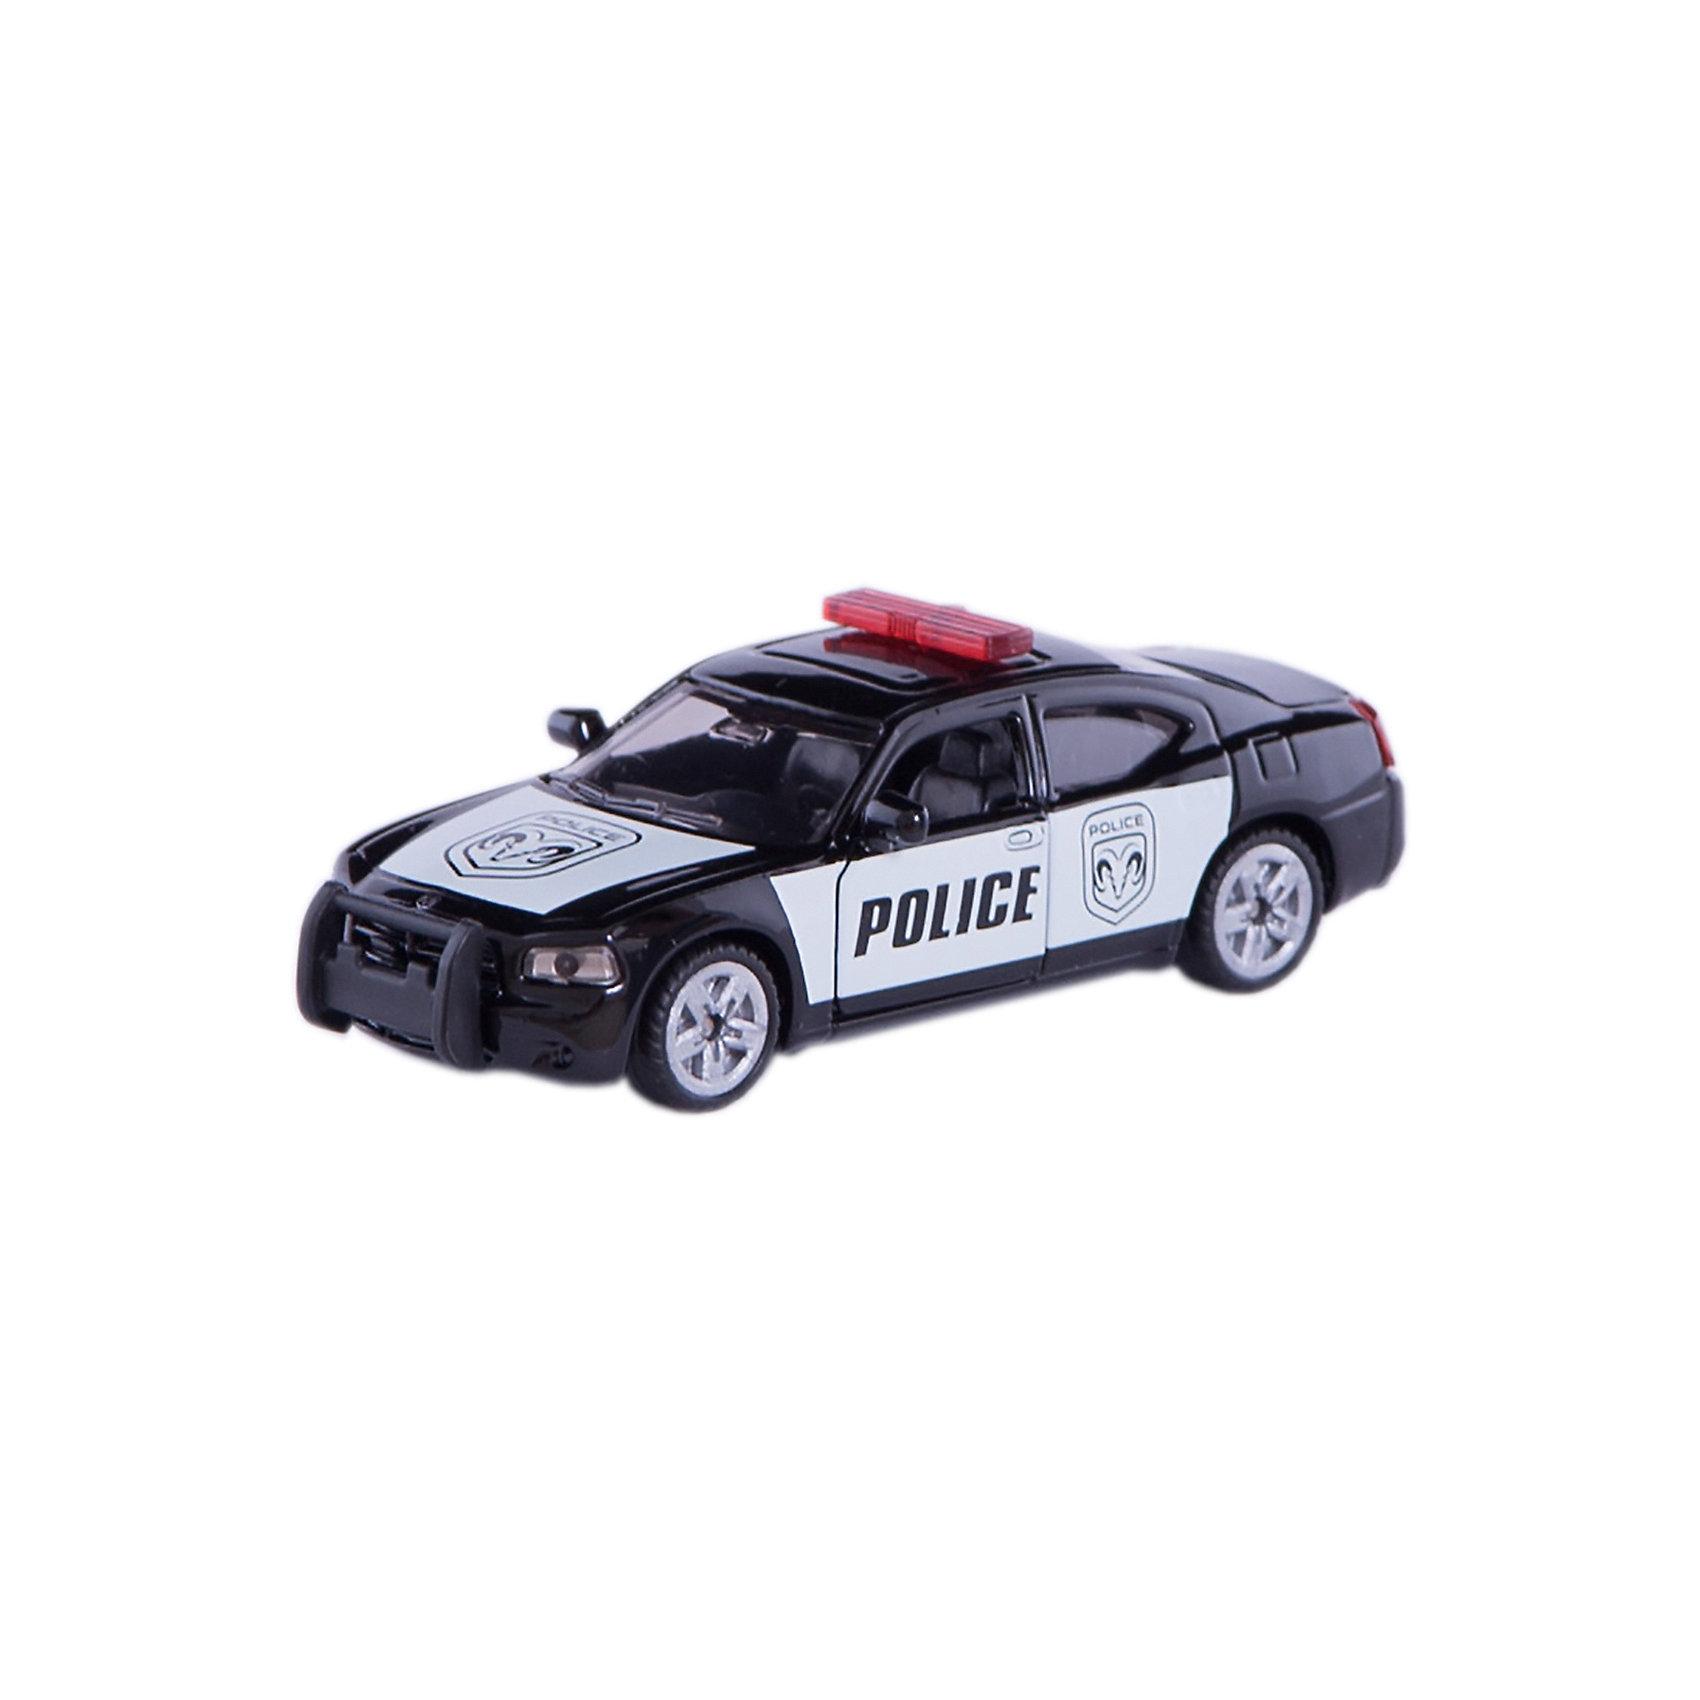 SIKU SIKU 1404 Полицейская машина игрушка siku ауди r8 8 0 3 7 2 4см 1430